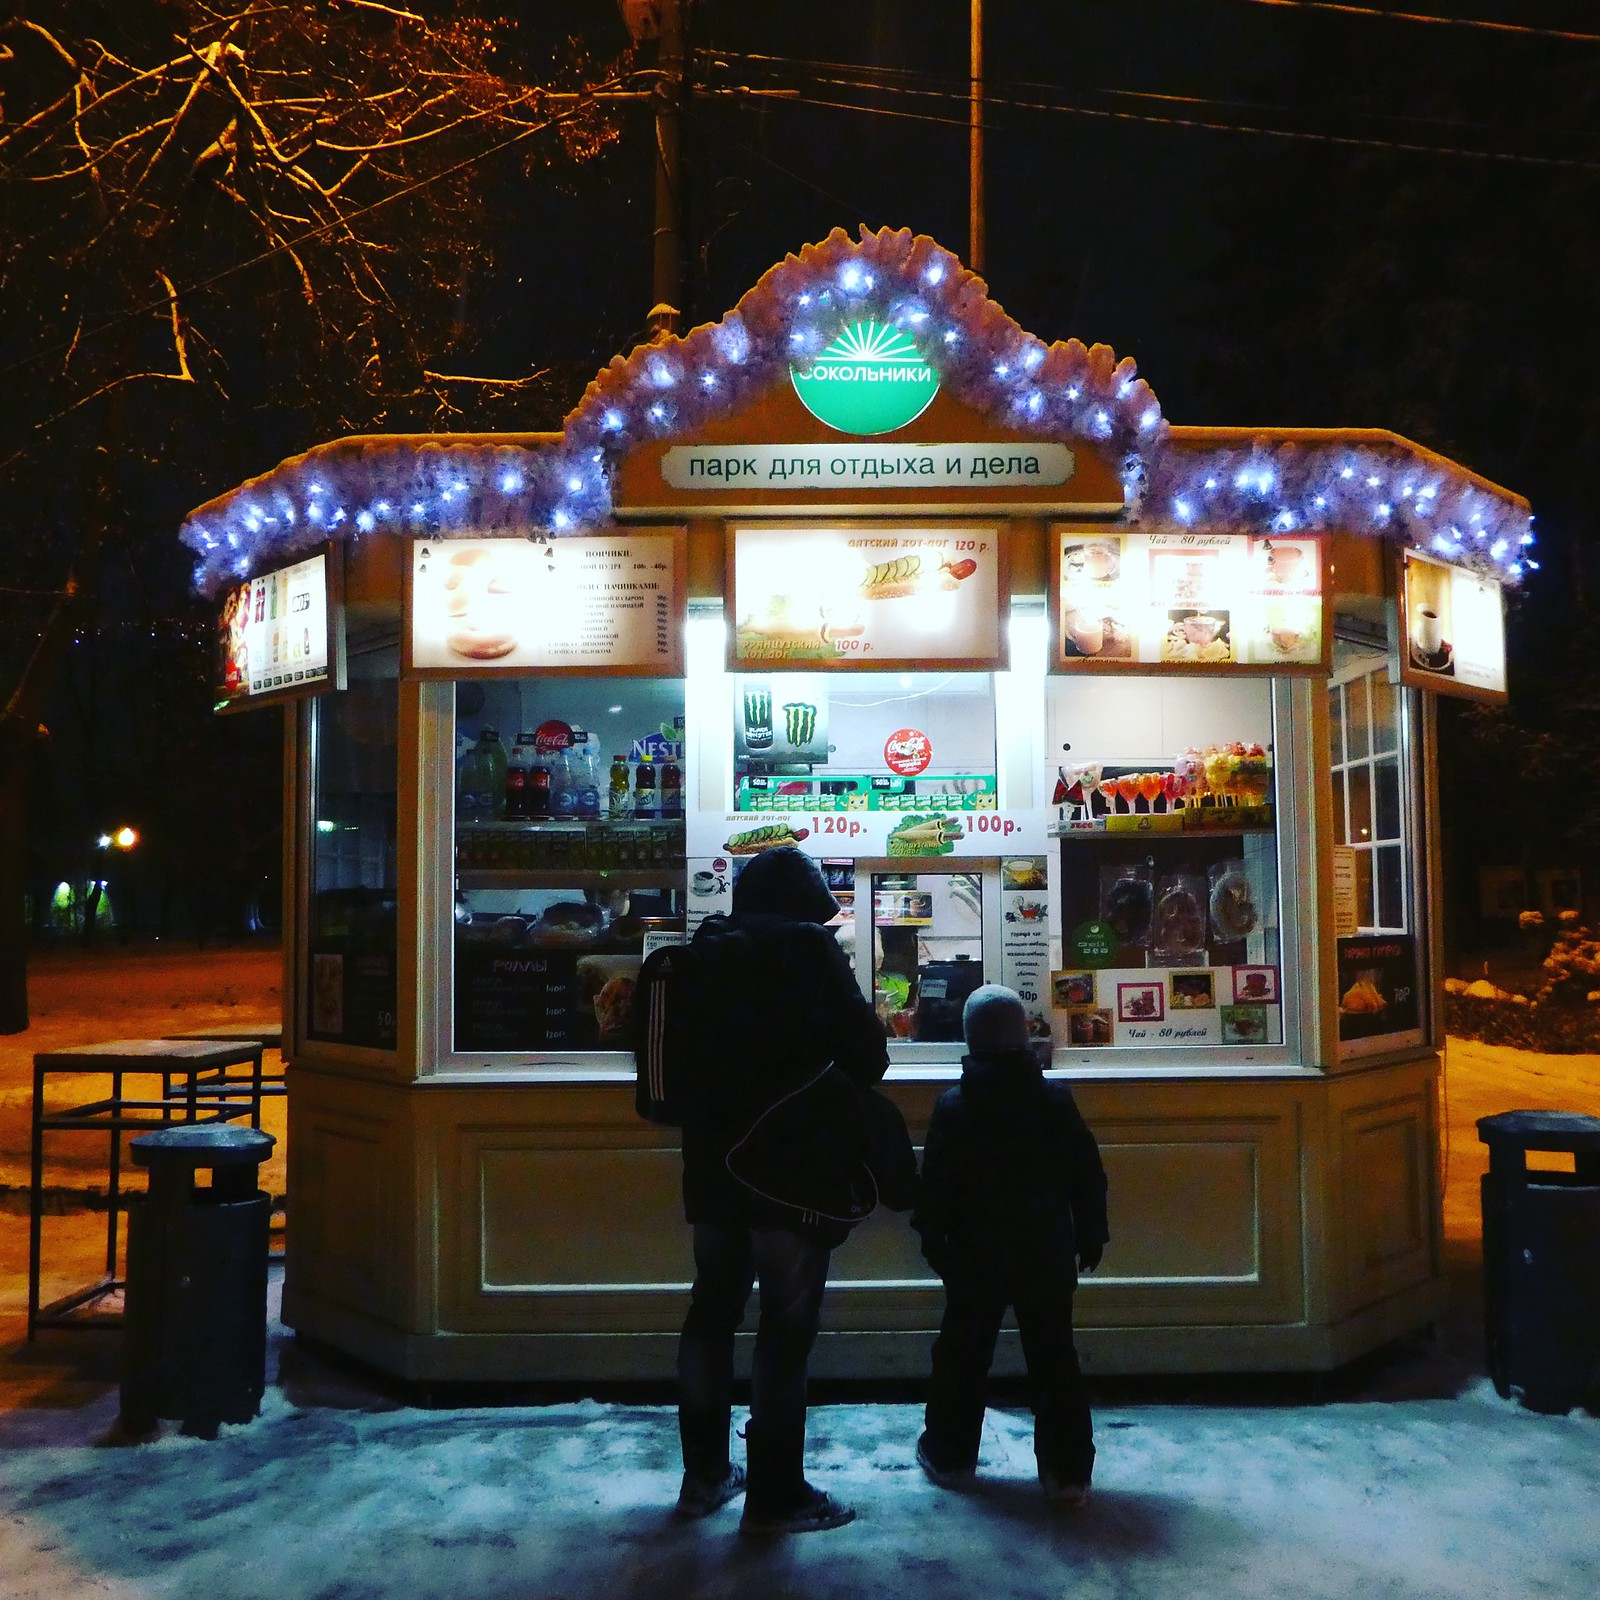 Sokolniki Park Moscow